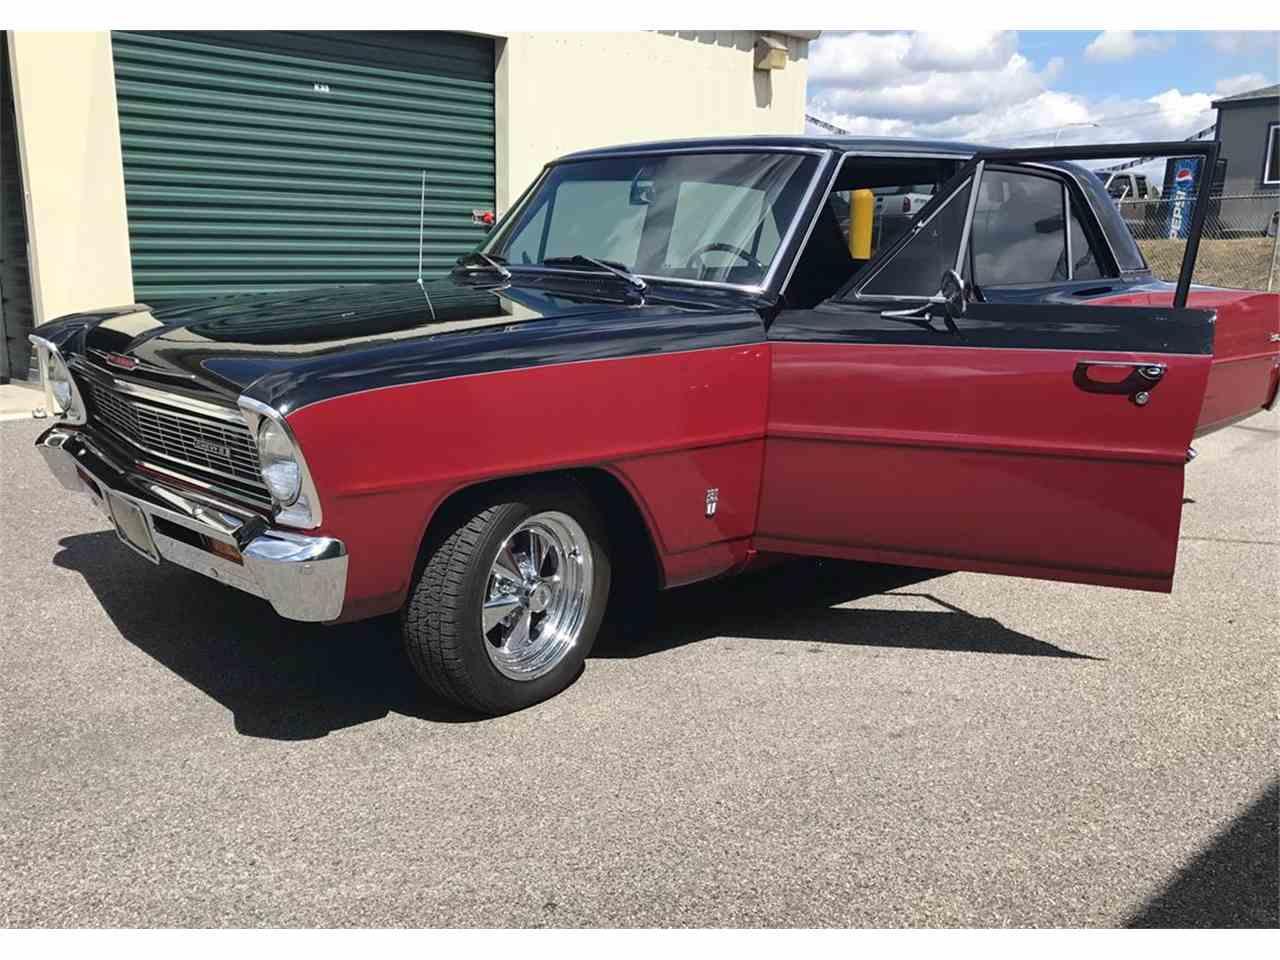 1967 Chevrolet Nova for Sale on ClassicCars.com - 35 Available